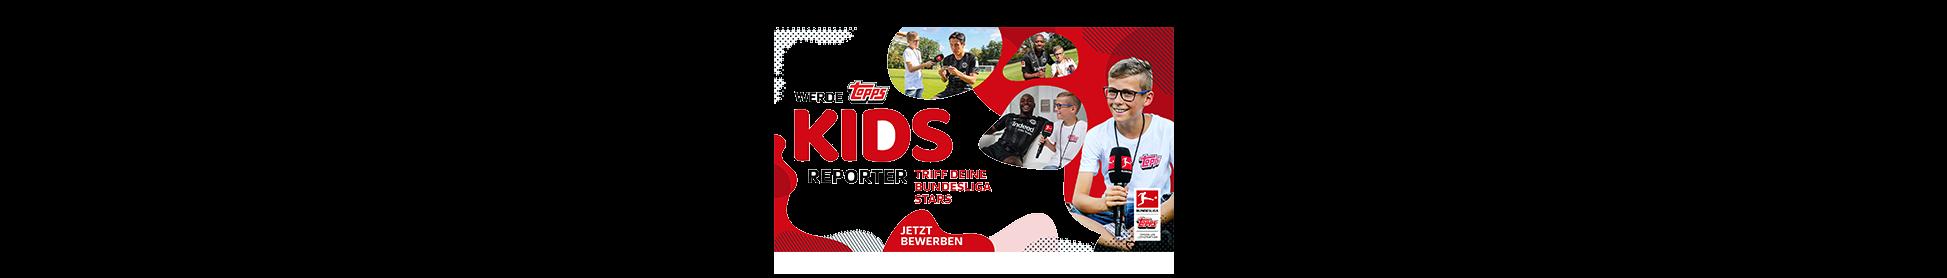 Topps Kids Reporter 2019 geht in den Endspurt